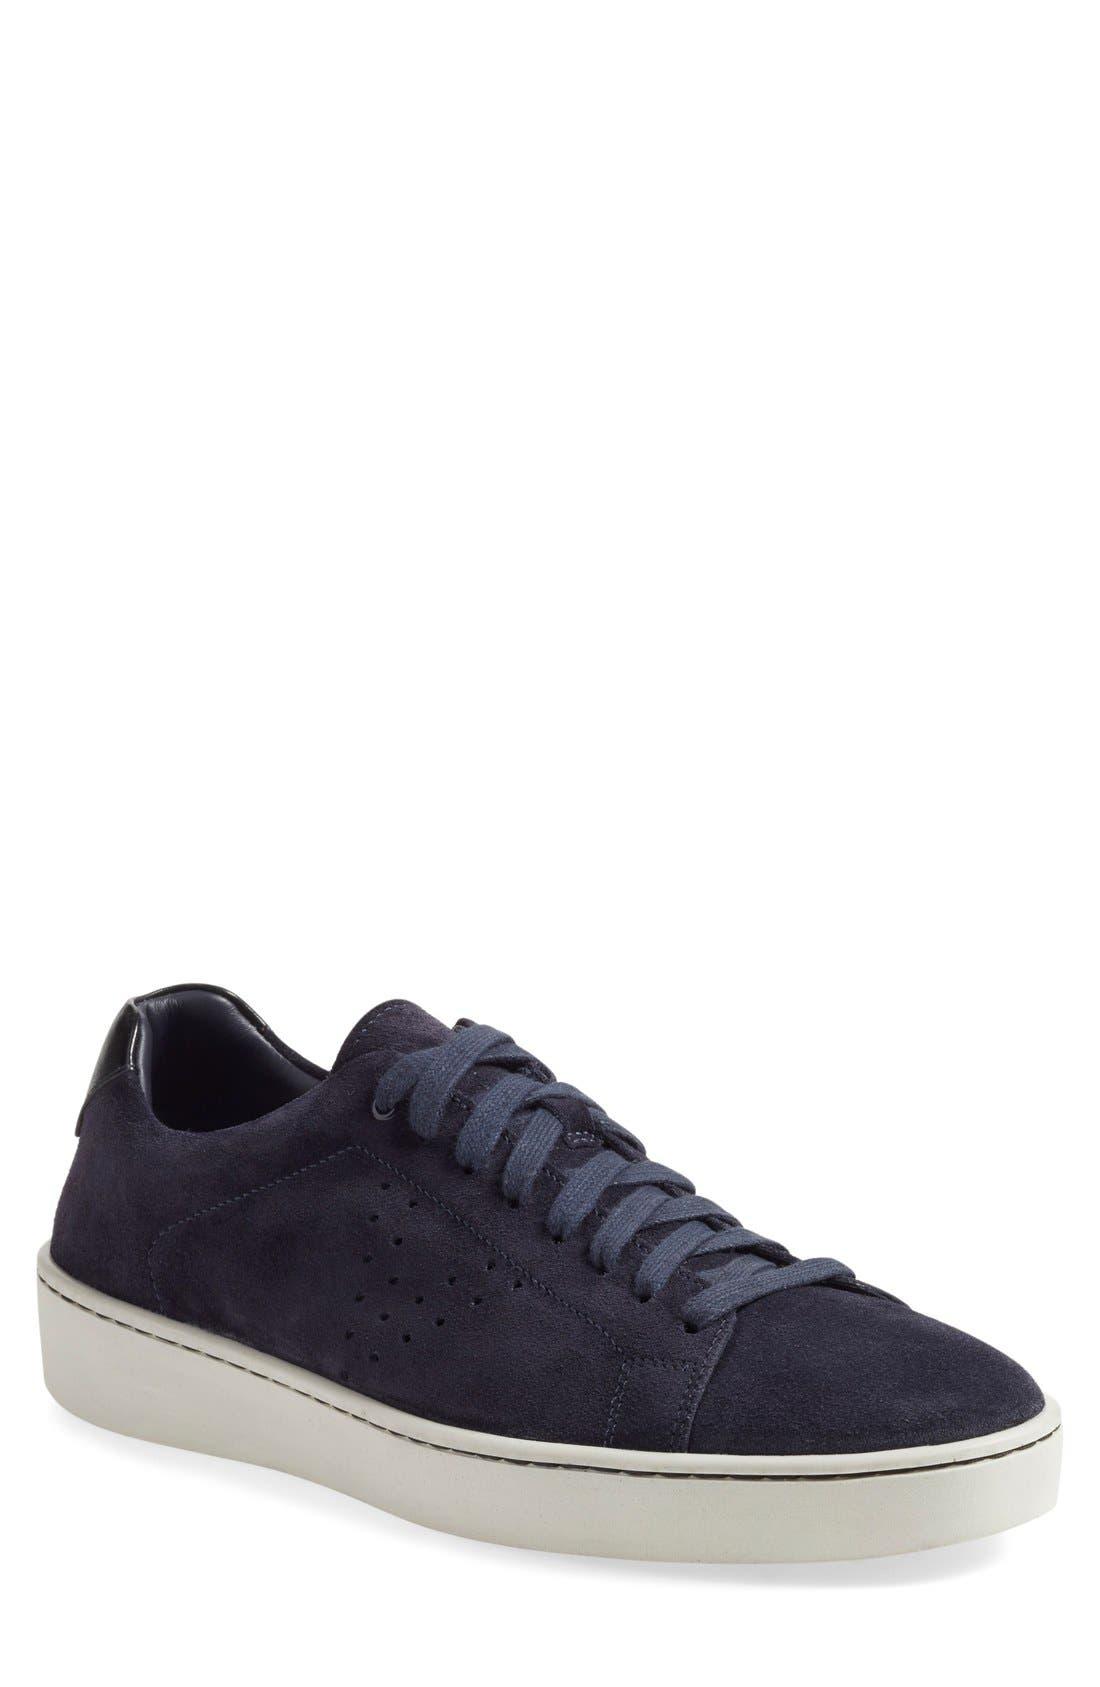 'Simon' Perforated Sneaker,                             Main thumbnail 1, color,                             407